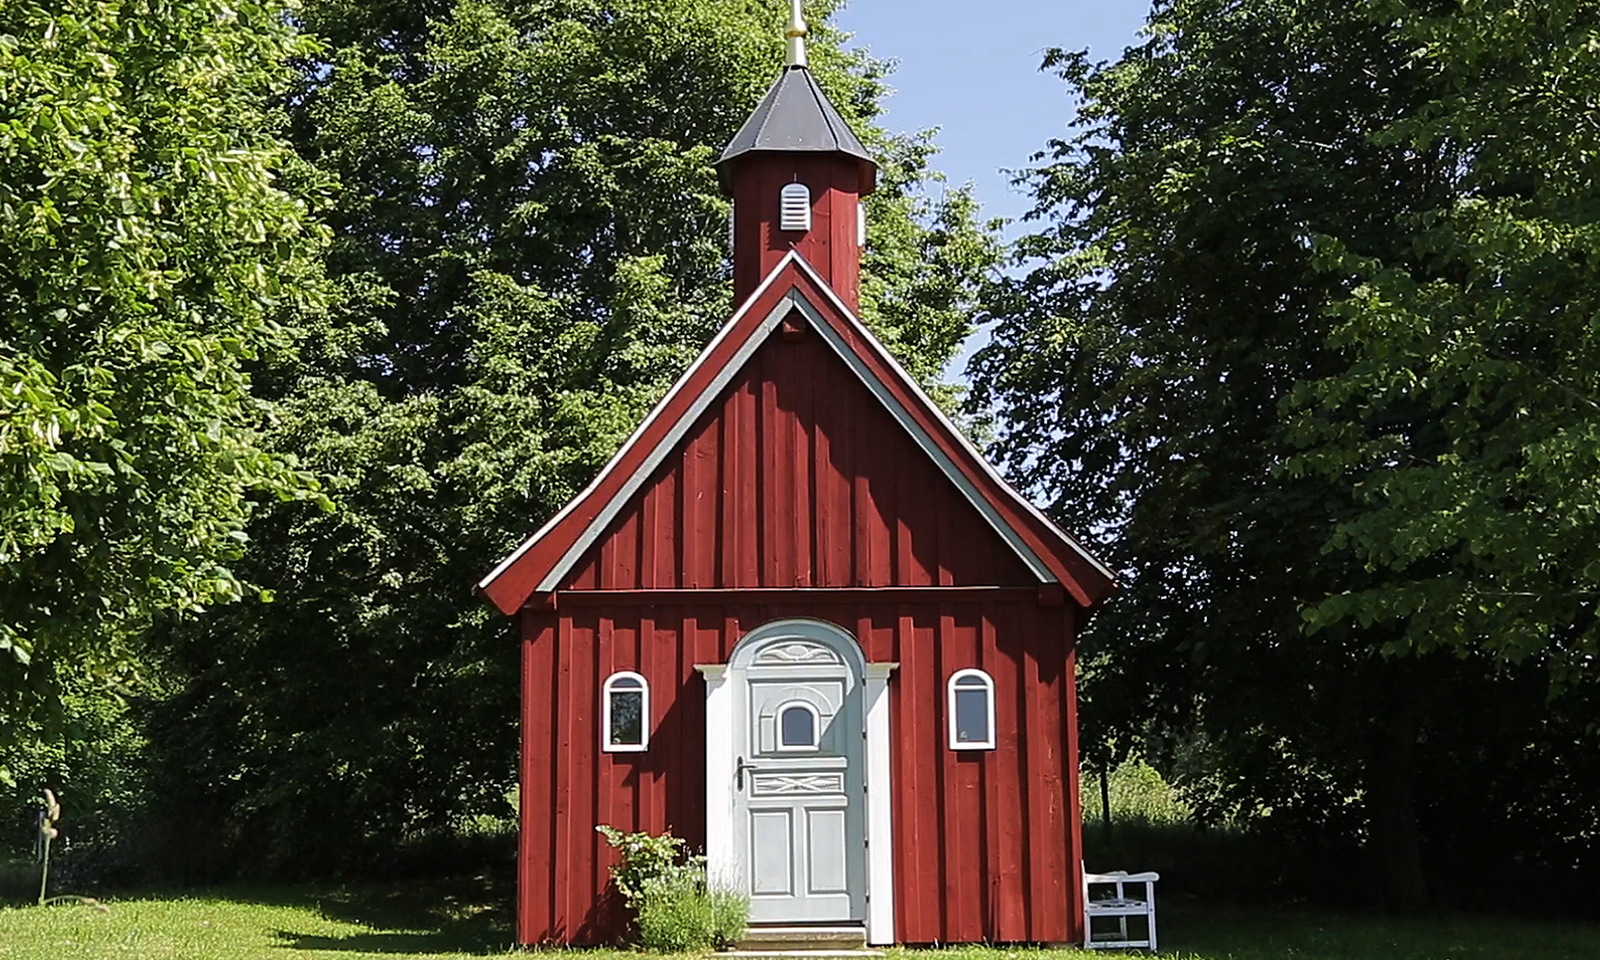 190610_Kleinodien-Kapelle-Gut-Grillenoed_LM_hp